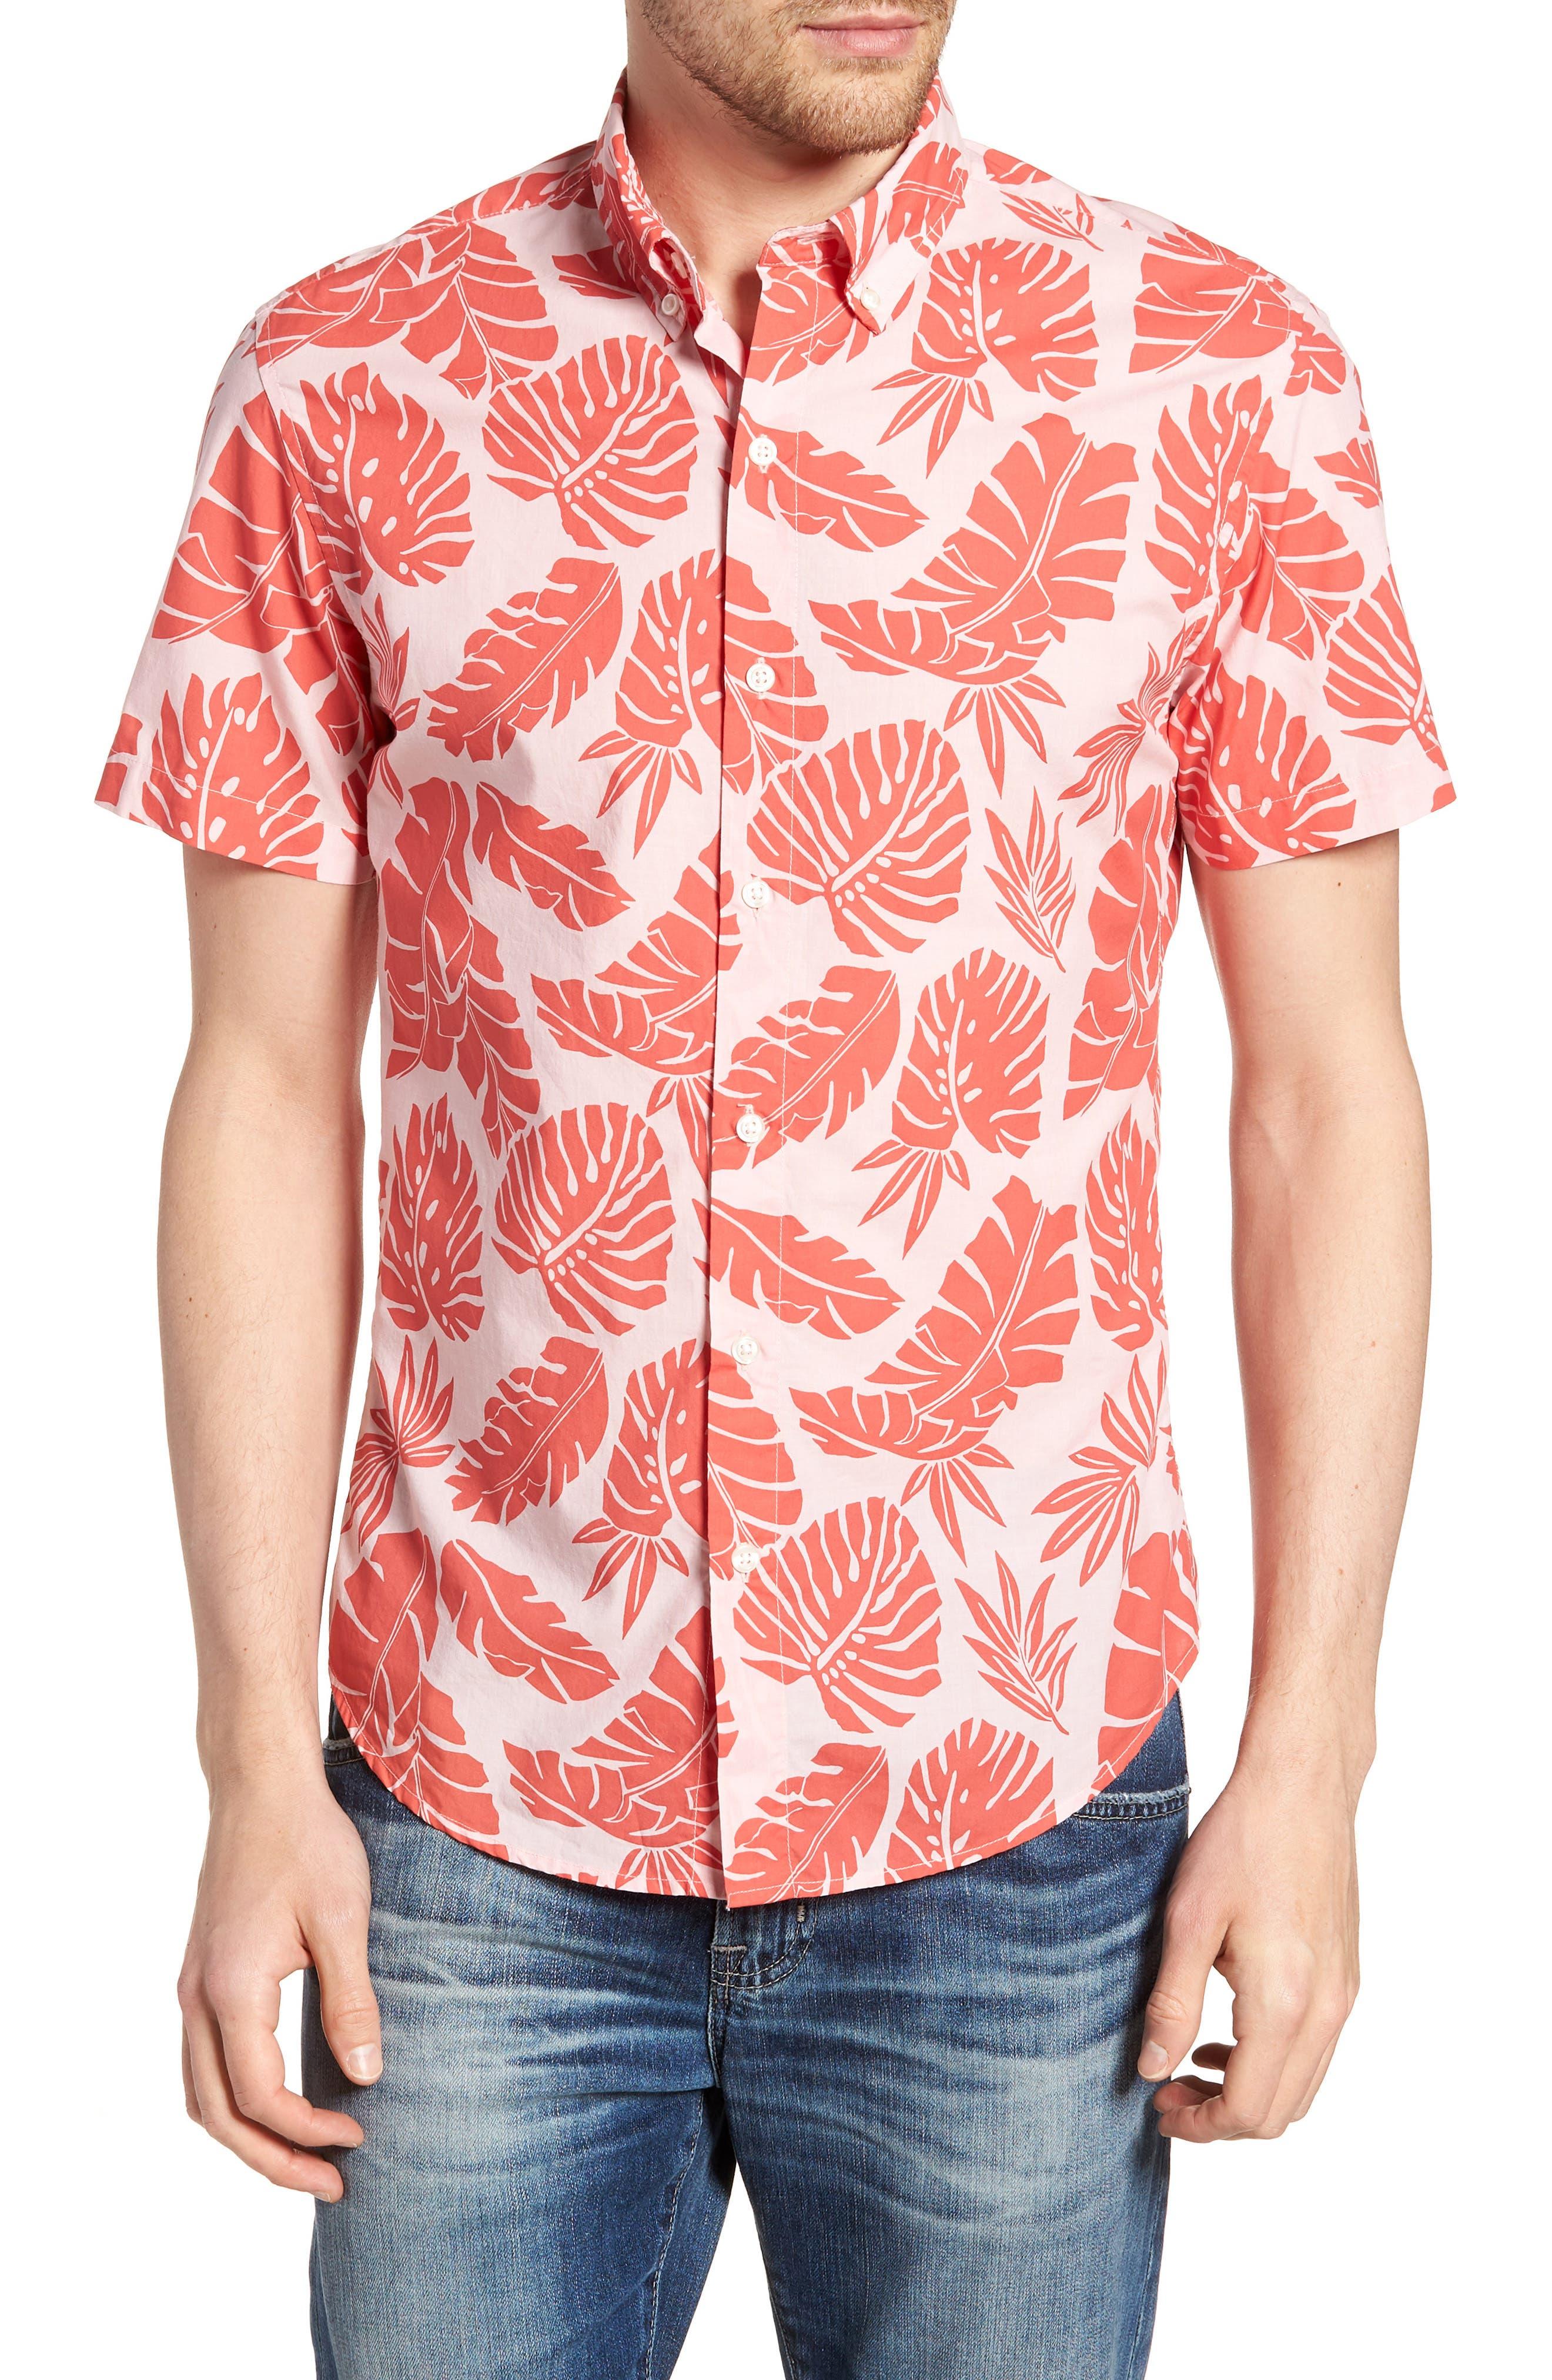 Bonobos Riviera Slim Fit Palm Print Sport Shirt, Pink